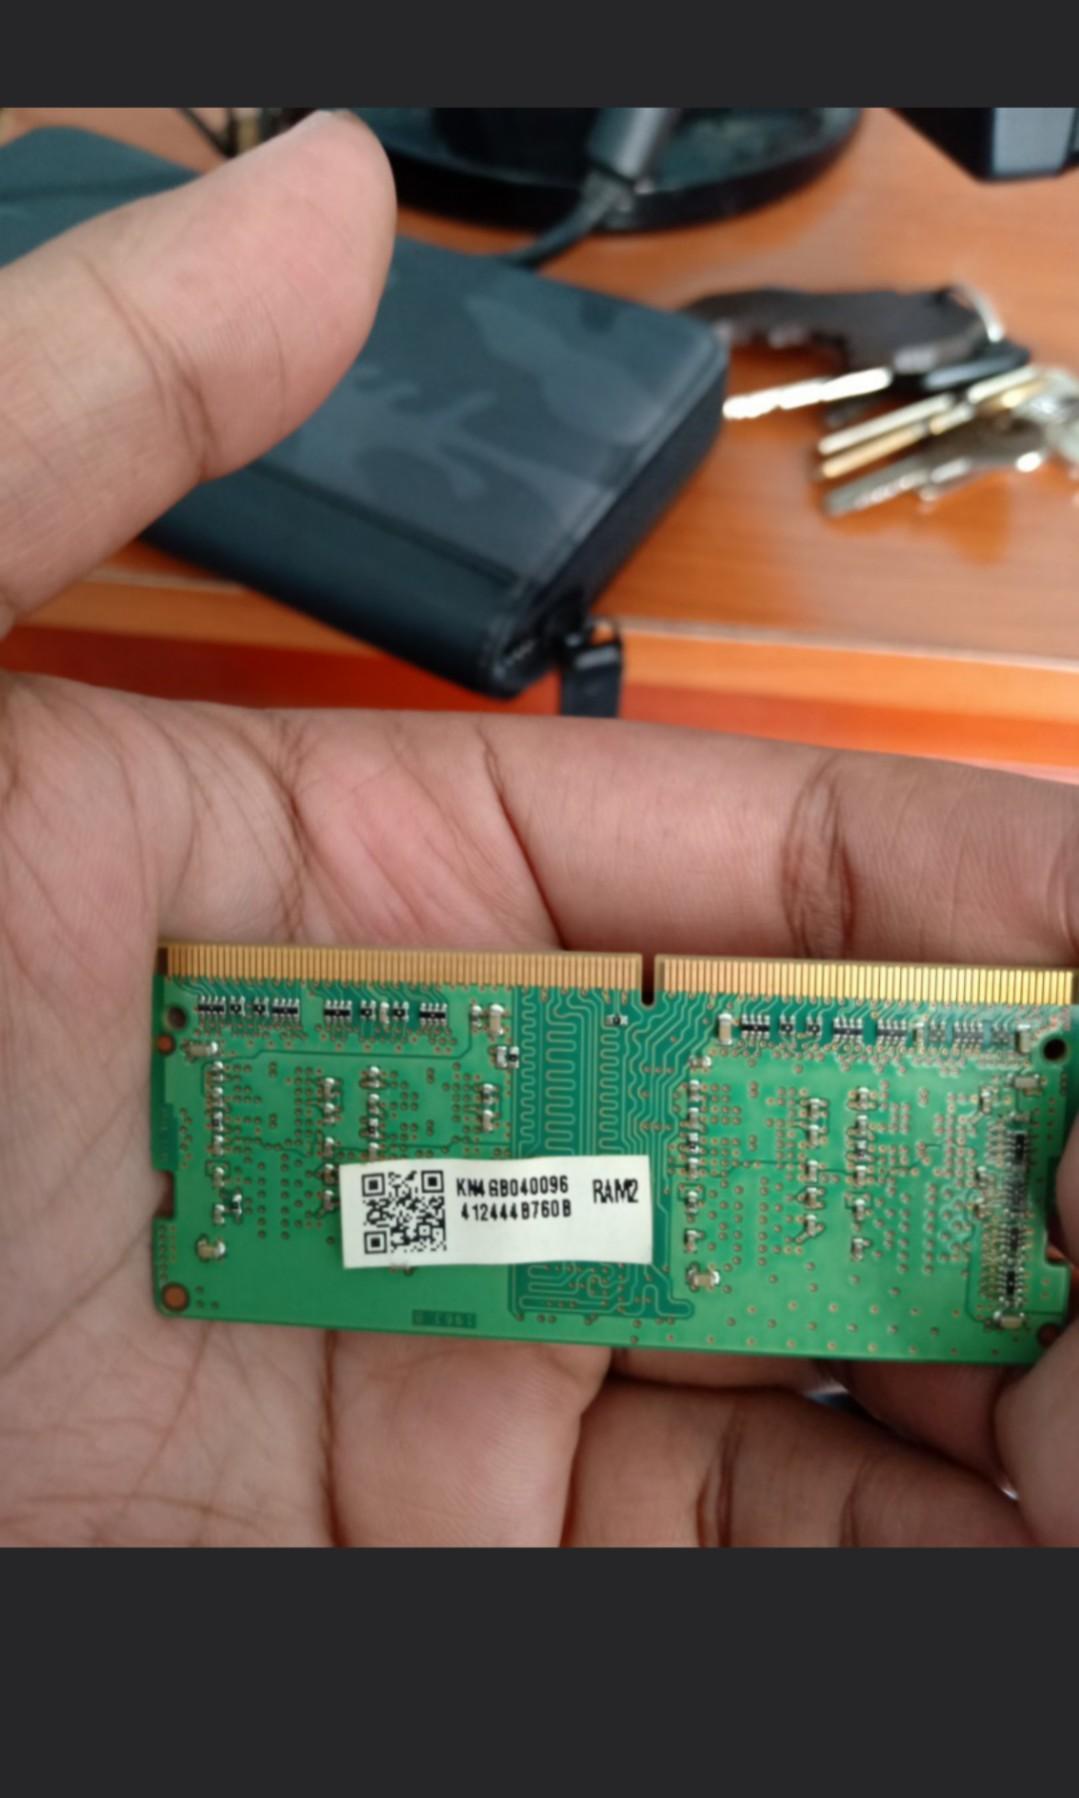 #mauthr ram laptop 4gb ddr 4 ada sepasang